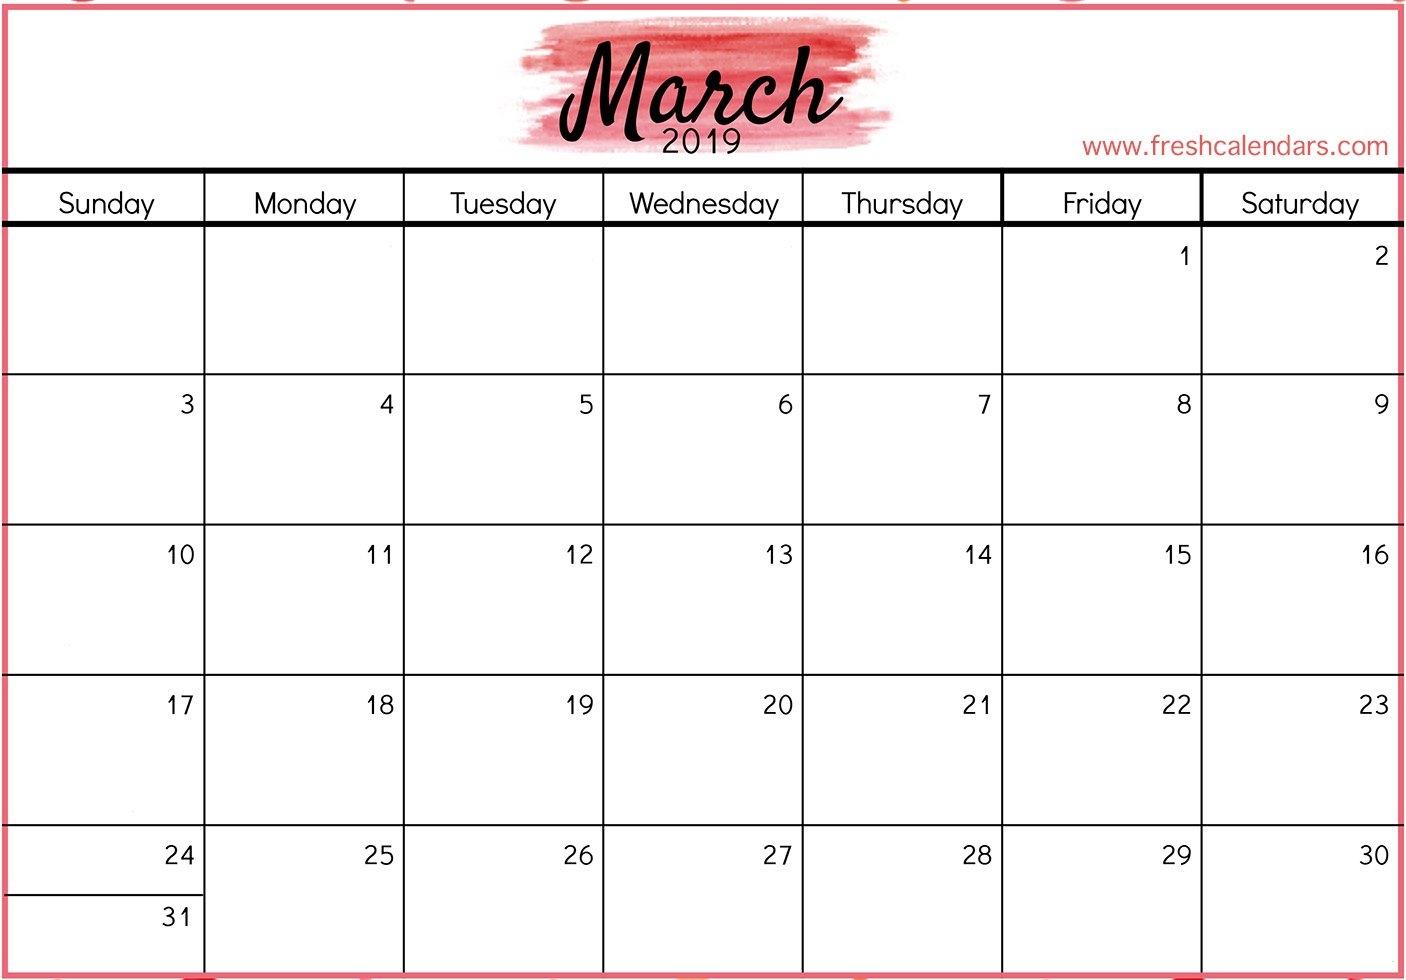 March 2019 Printable Calendars – Fresh Calendars Calendar Of 2019 March